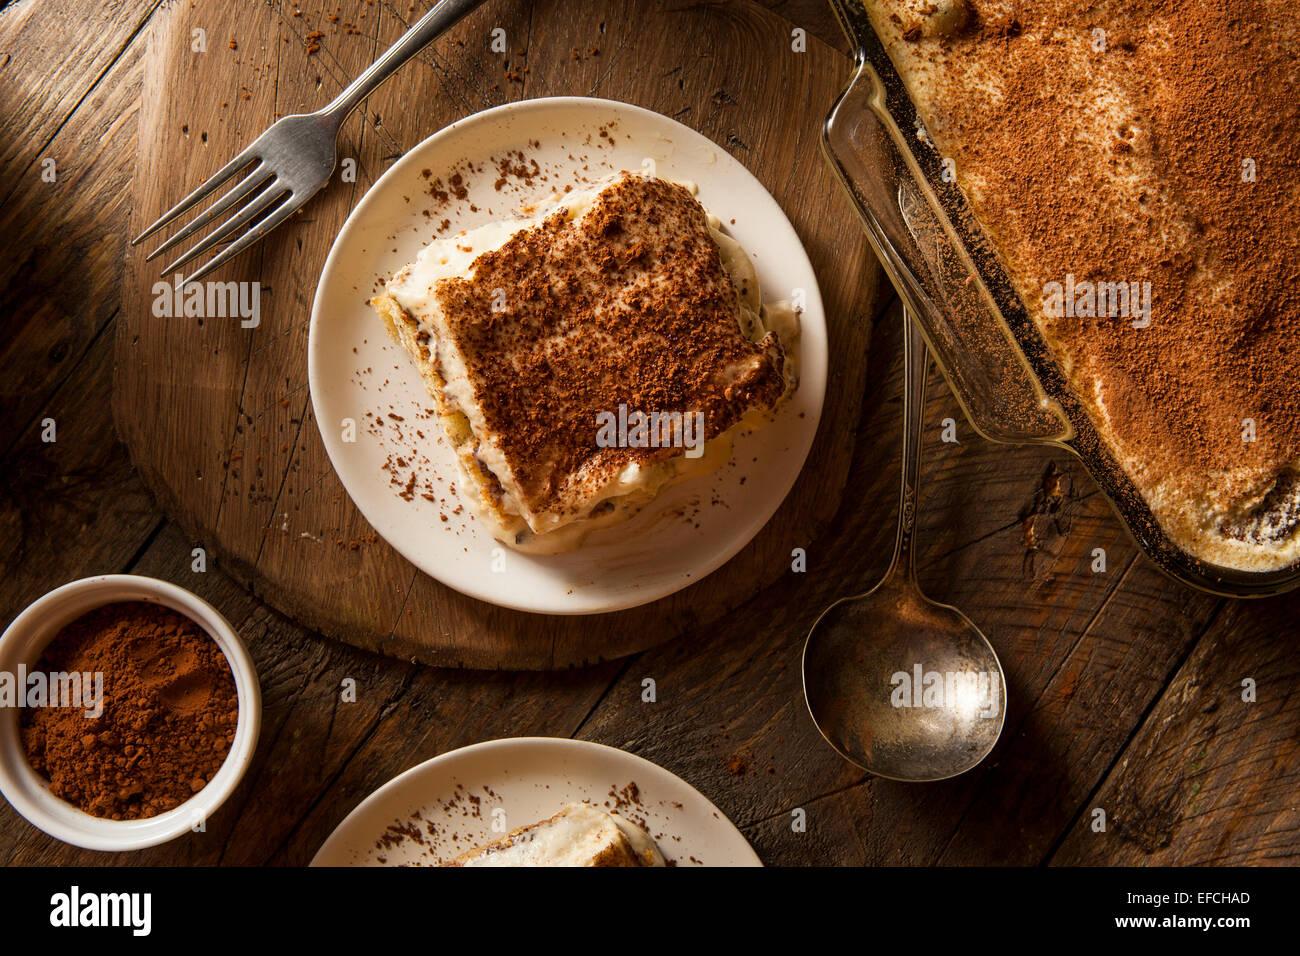 Tiramisu maison pour dessert avec café et chocolat Photo Stock